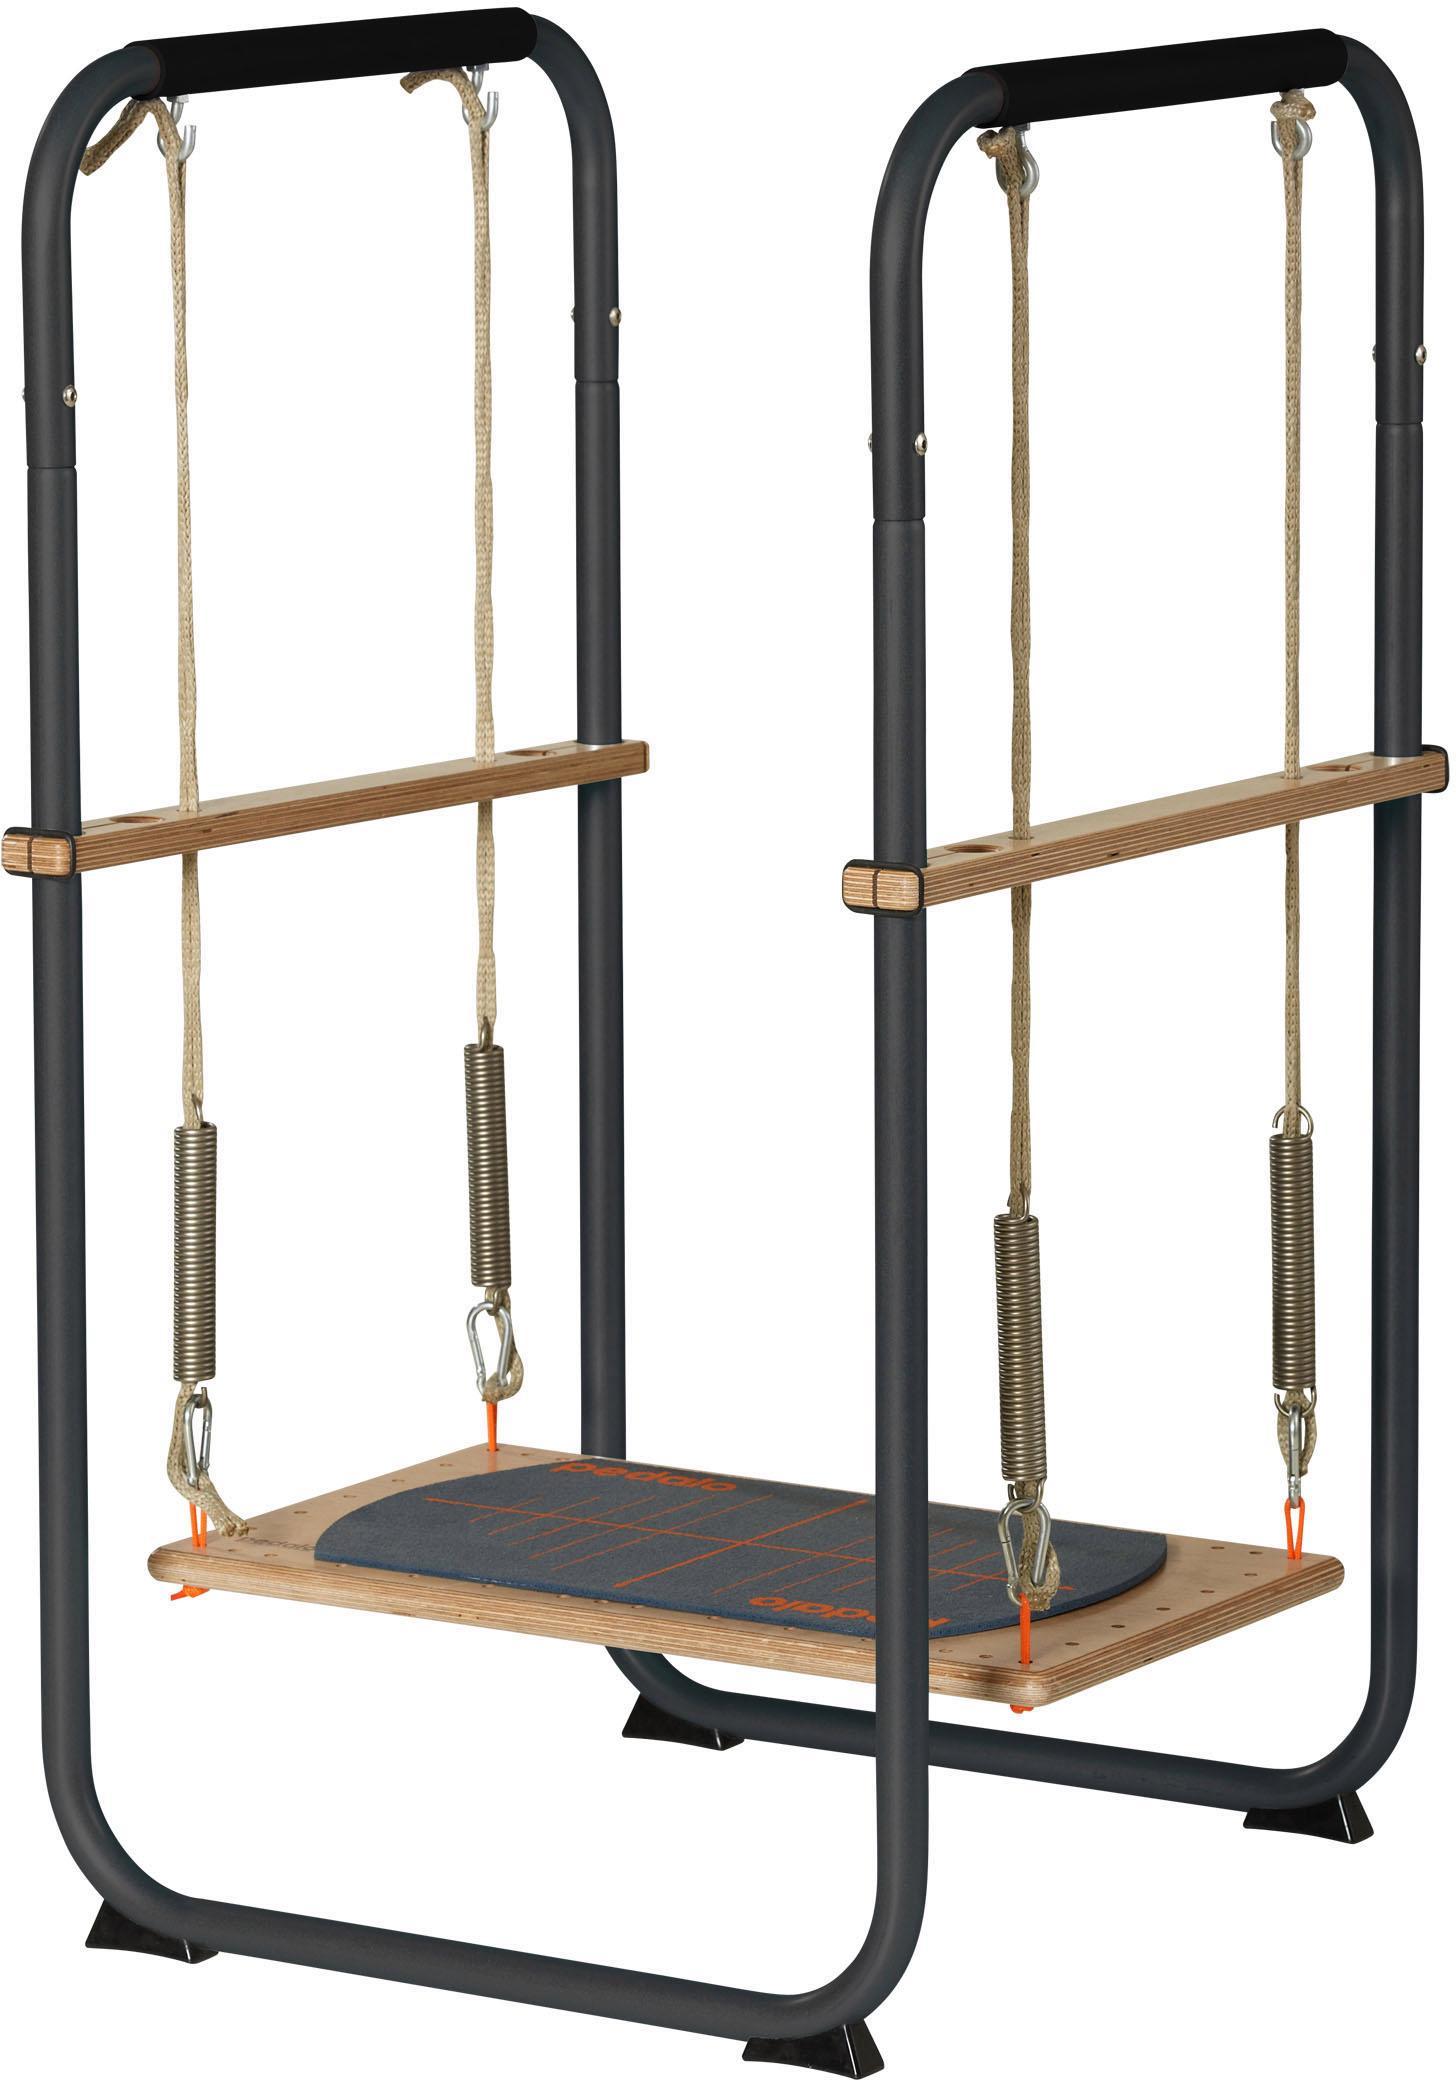 pedalo Stabilisations-Therapiegerät Pedalo Stabilisator Therapie bunt Fitness Ausrüstung Sportarten Balancetrainer